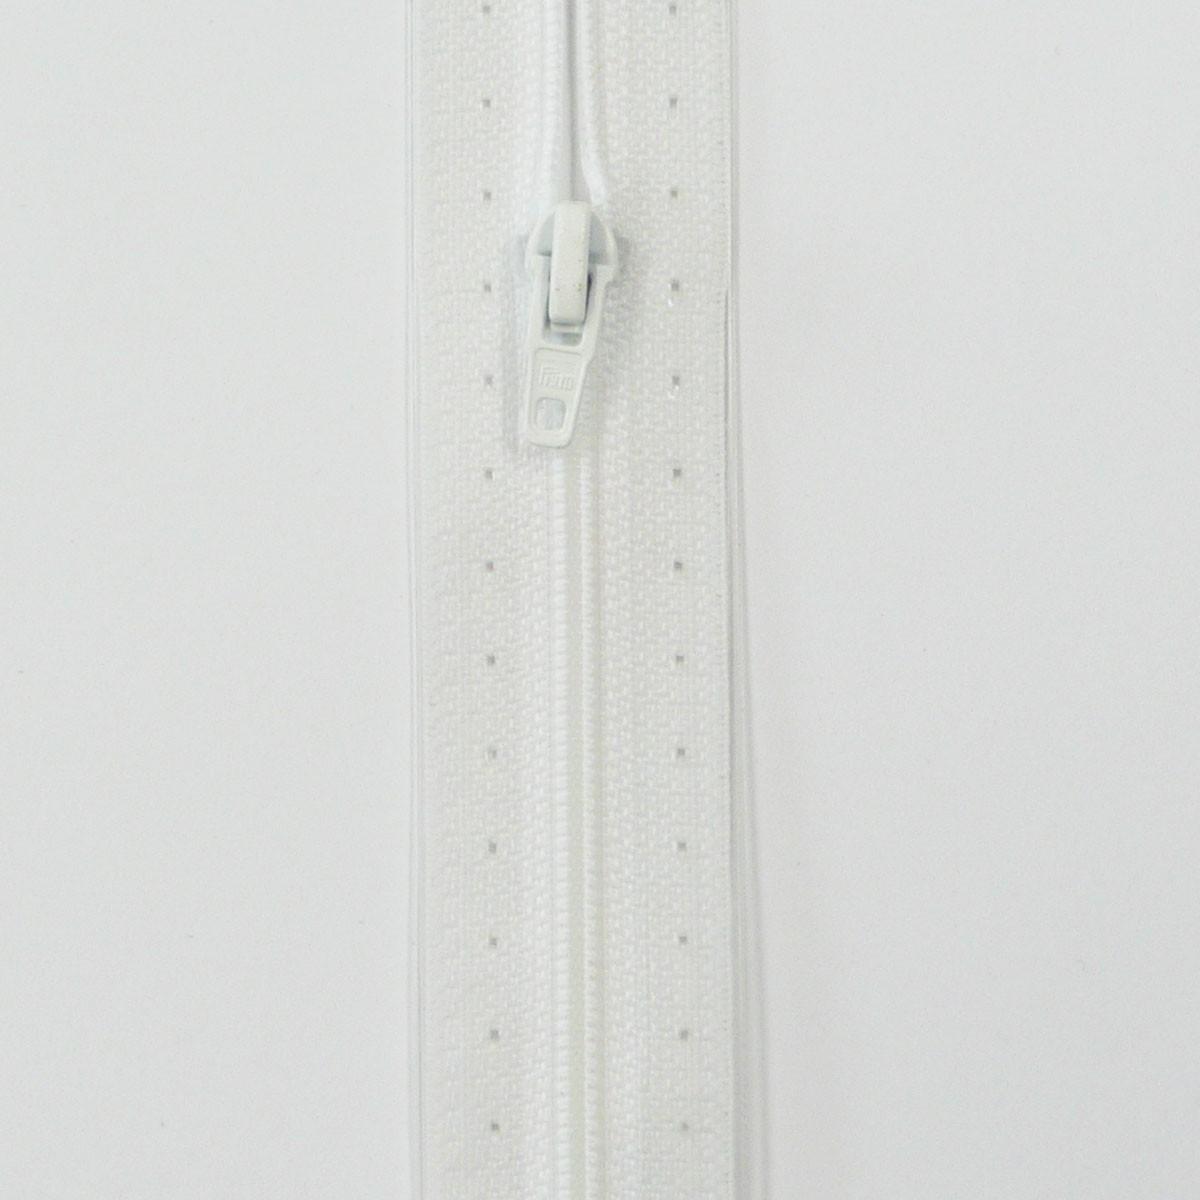 RV S1 Typ 0 ut 22 cm Fla weiß